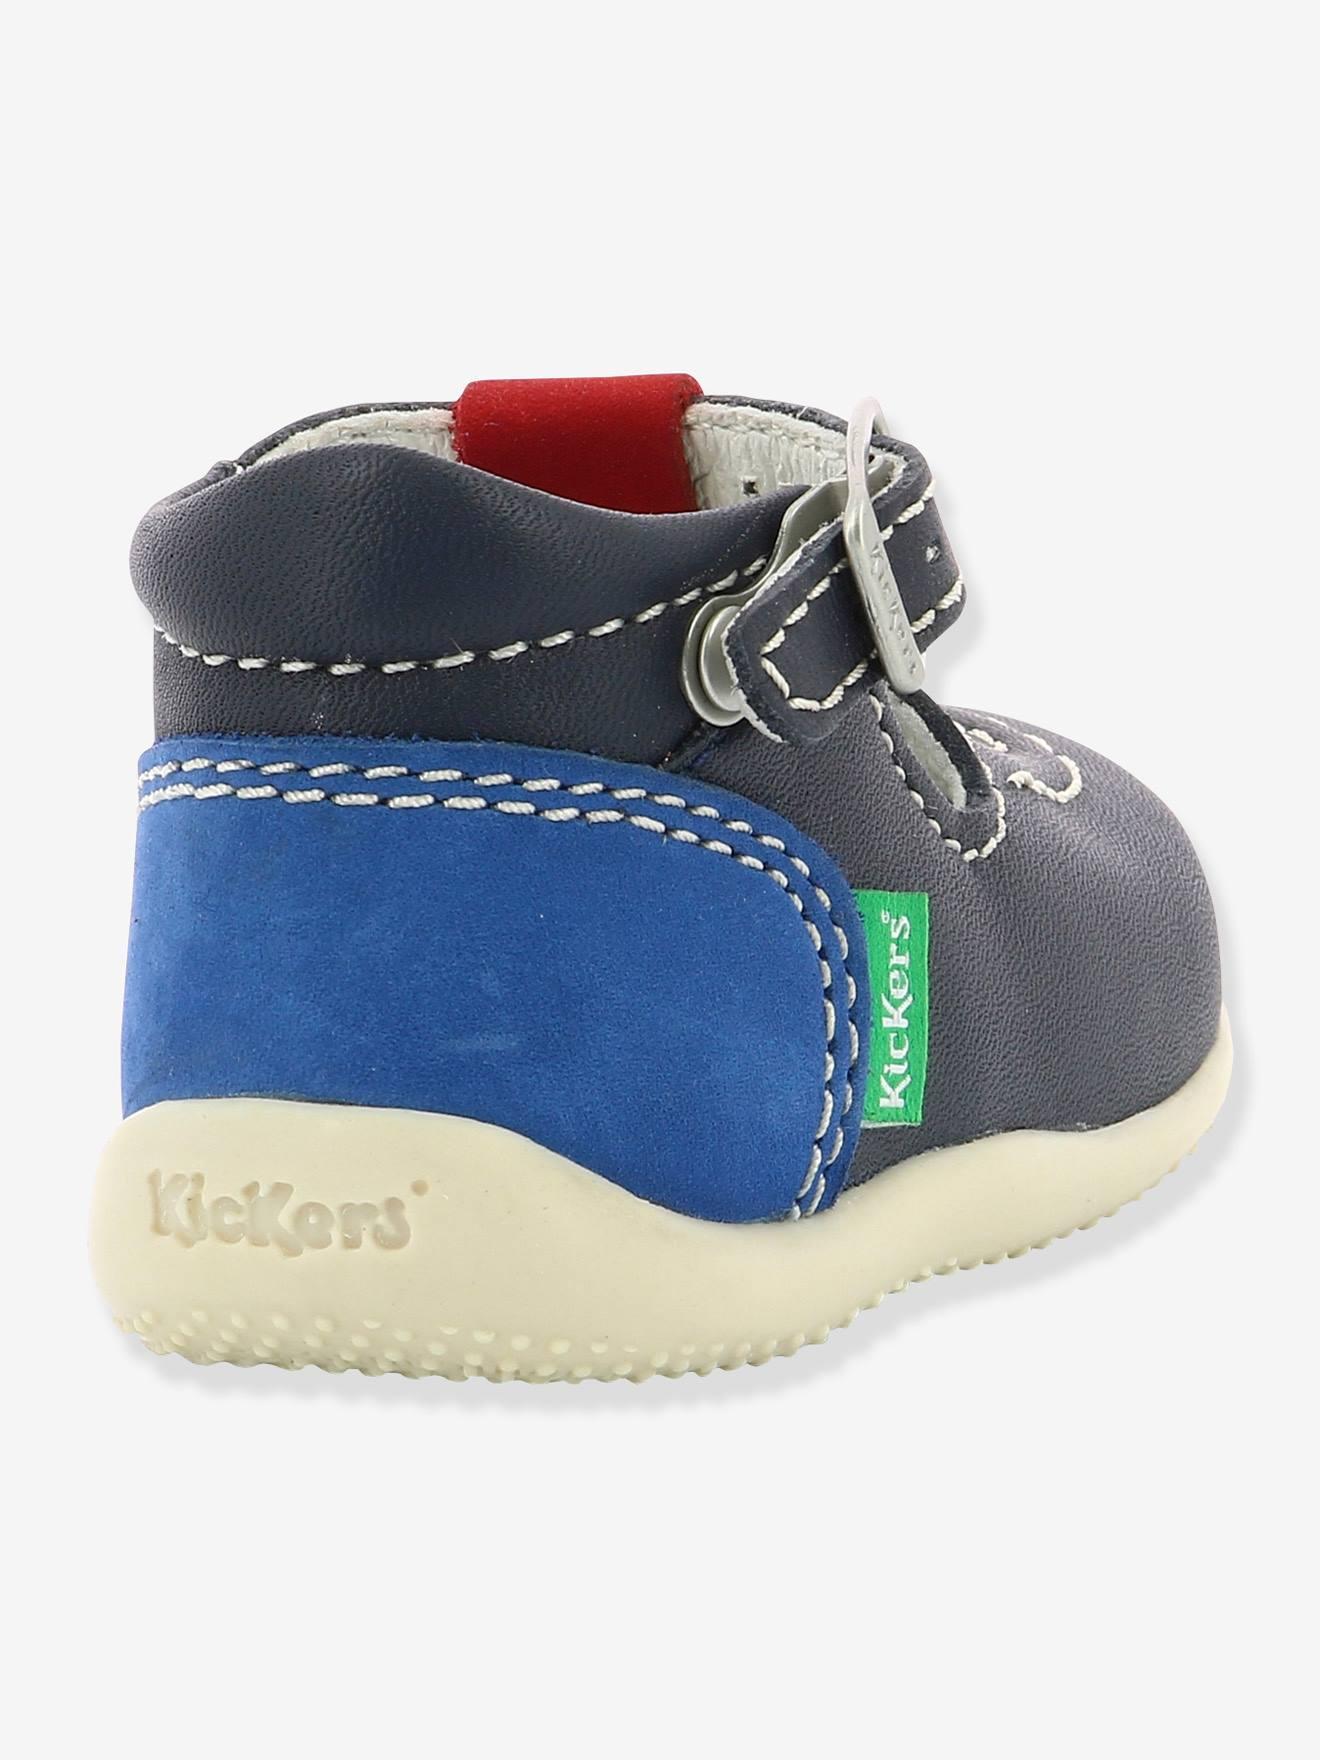 c8247fb4 De Azul Piel Kickers® Bonbek Liso Kickers Sandalias Bebé Oscuro QBrosdtCxh